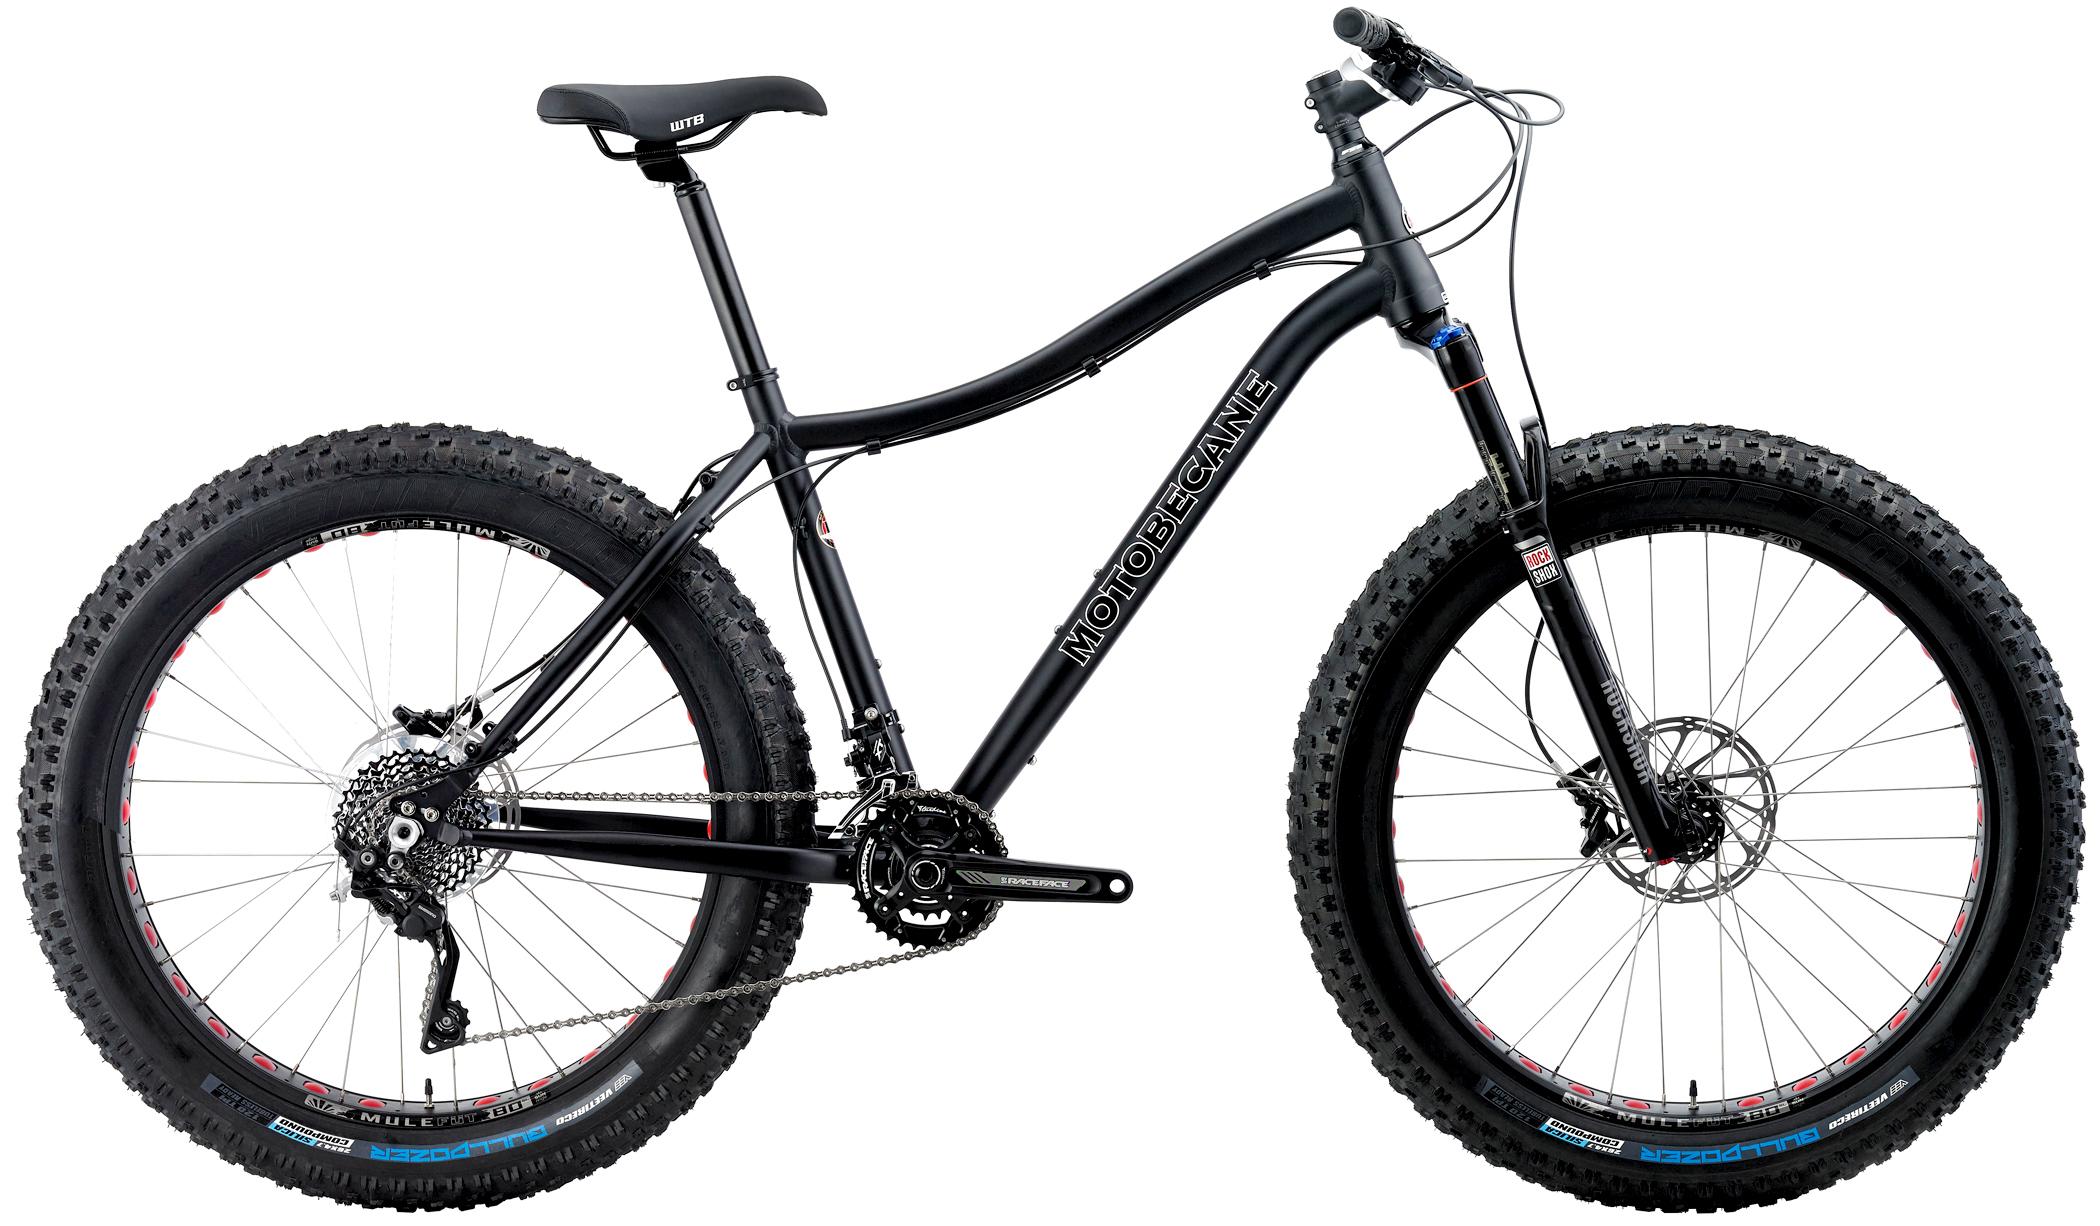 Save Up To 60 Off New Fat Bikes Motobecane New Boris The